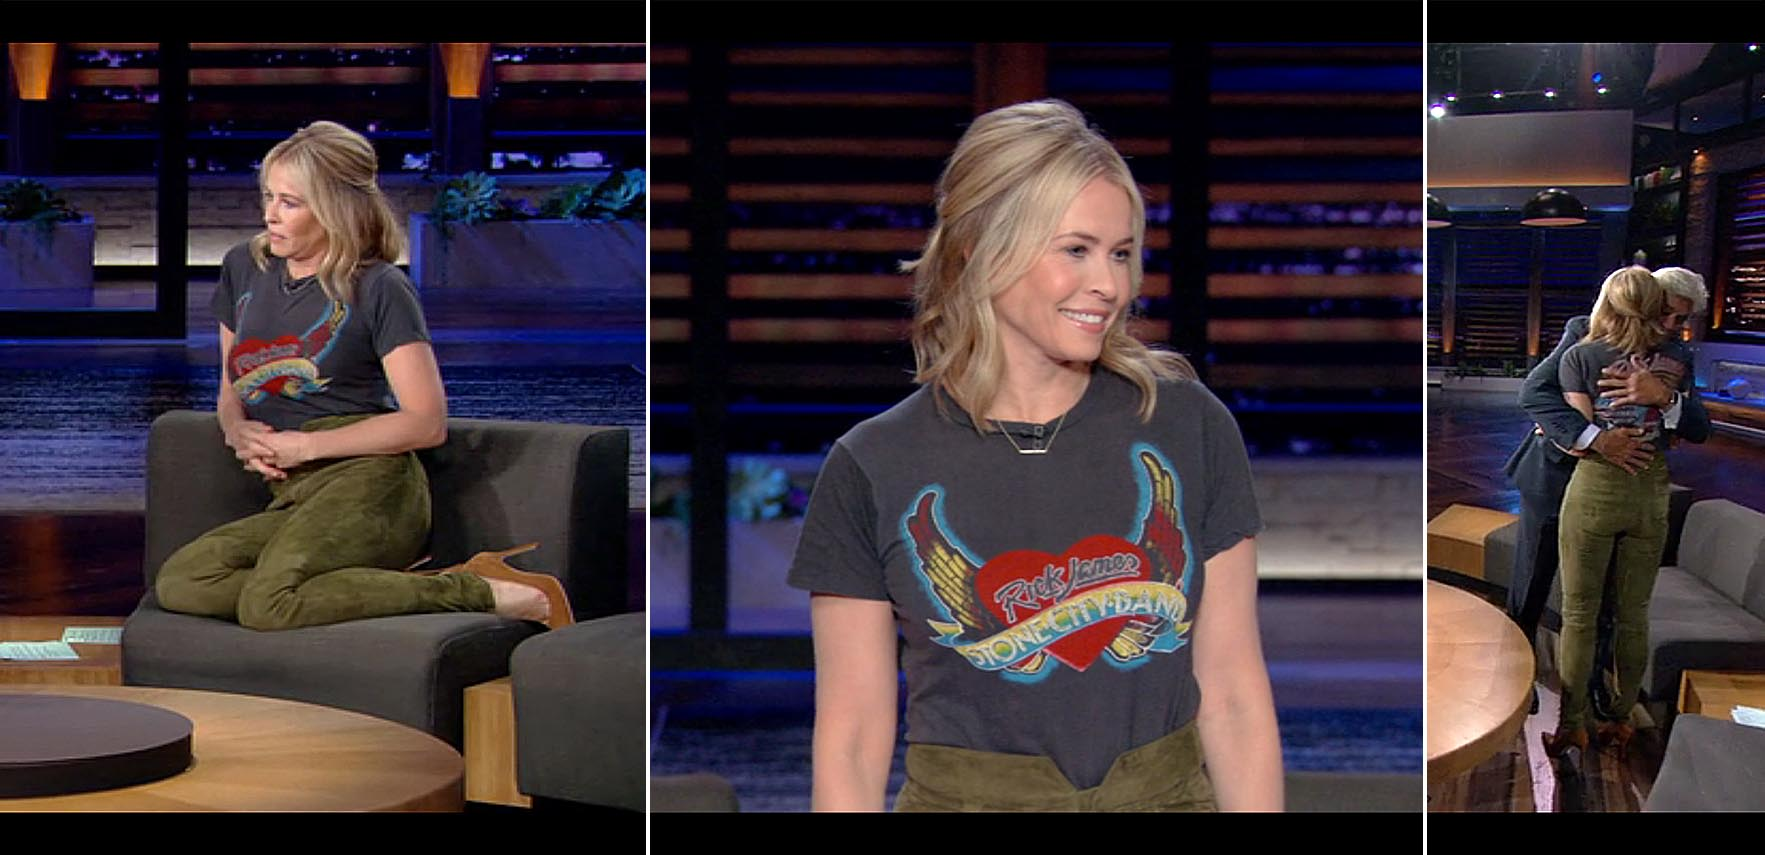 Chelsea Handler's Netflix Style: Band Tee and Velvet Pants